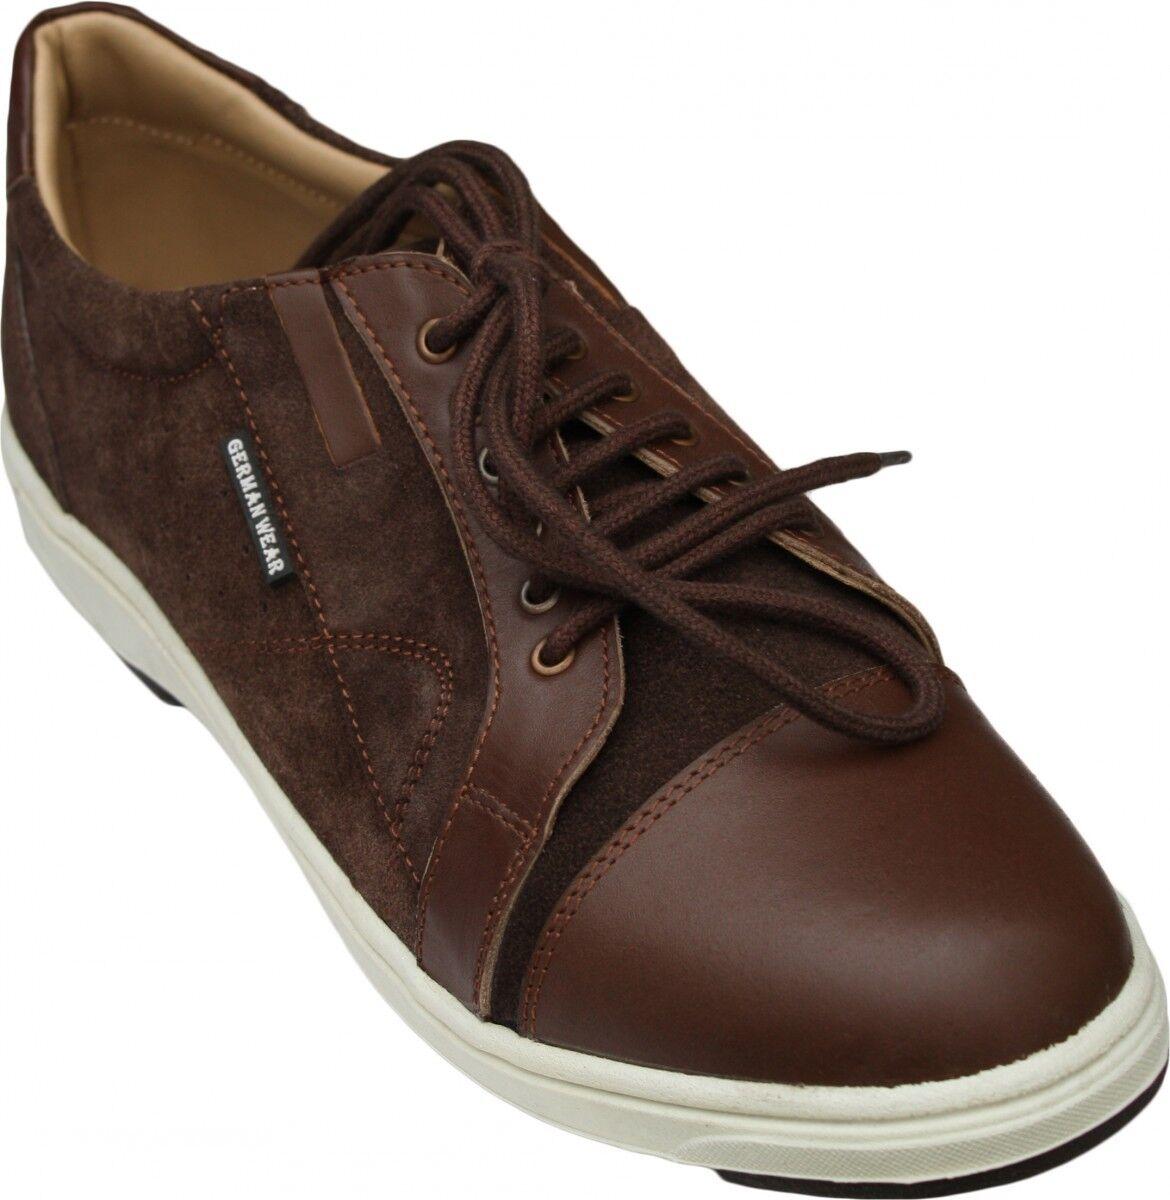 German wear, scarpe da ginnastica pelle scarpe da ginnastica in pelle scamosciata Marroneee | Qualità Superiore  | Sig/Sig Ra Scarpa